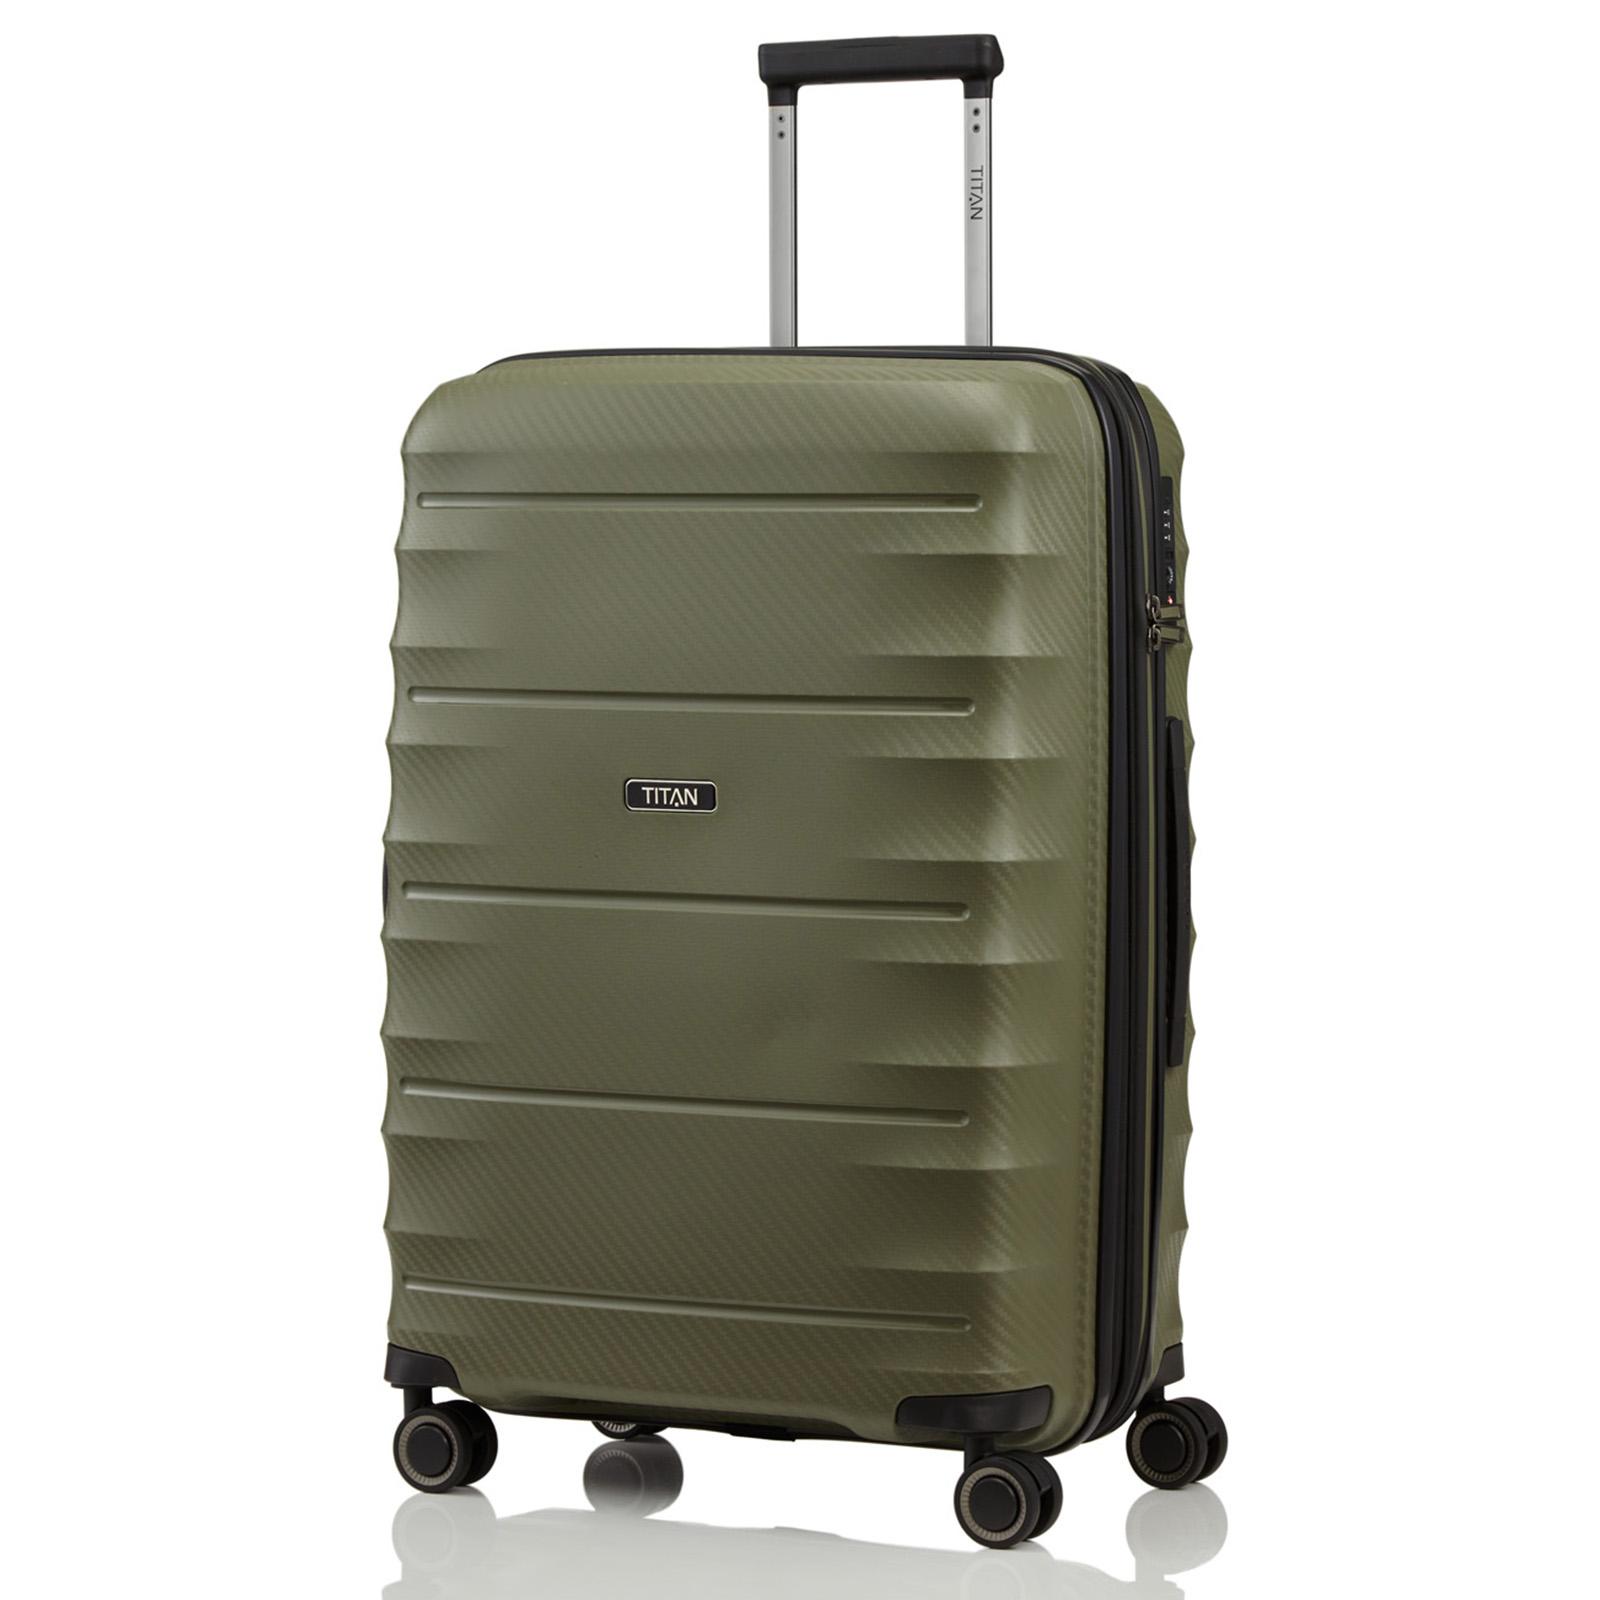 titan-highlight-khaki-67cm-trolley